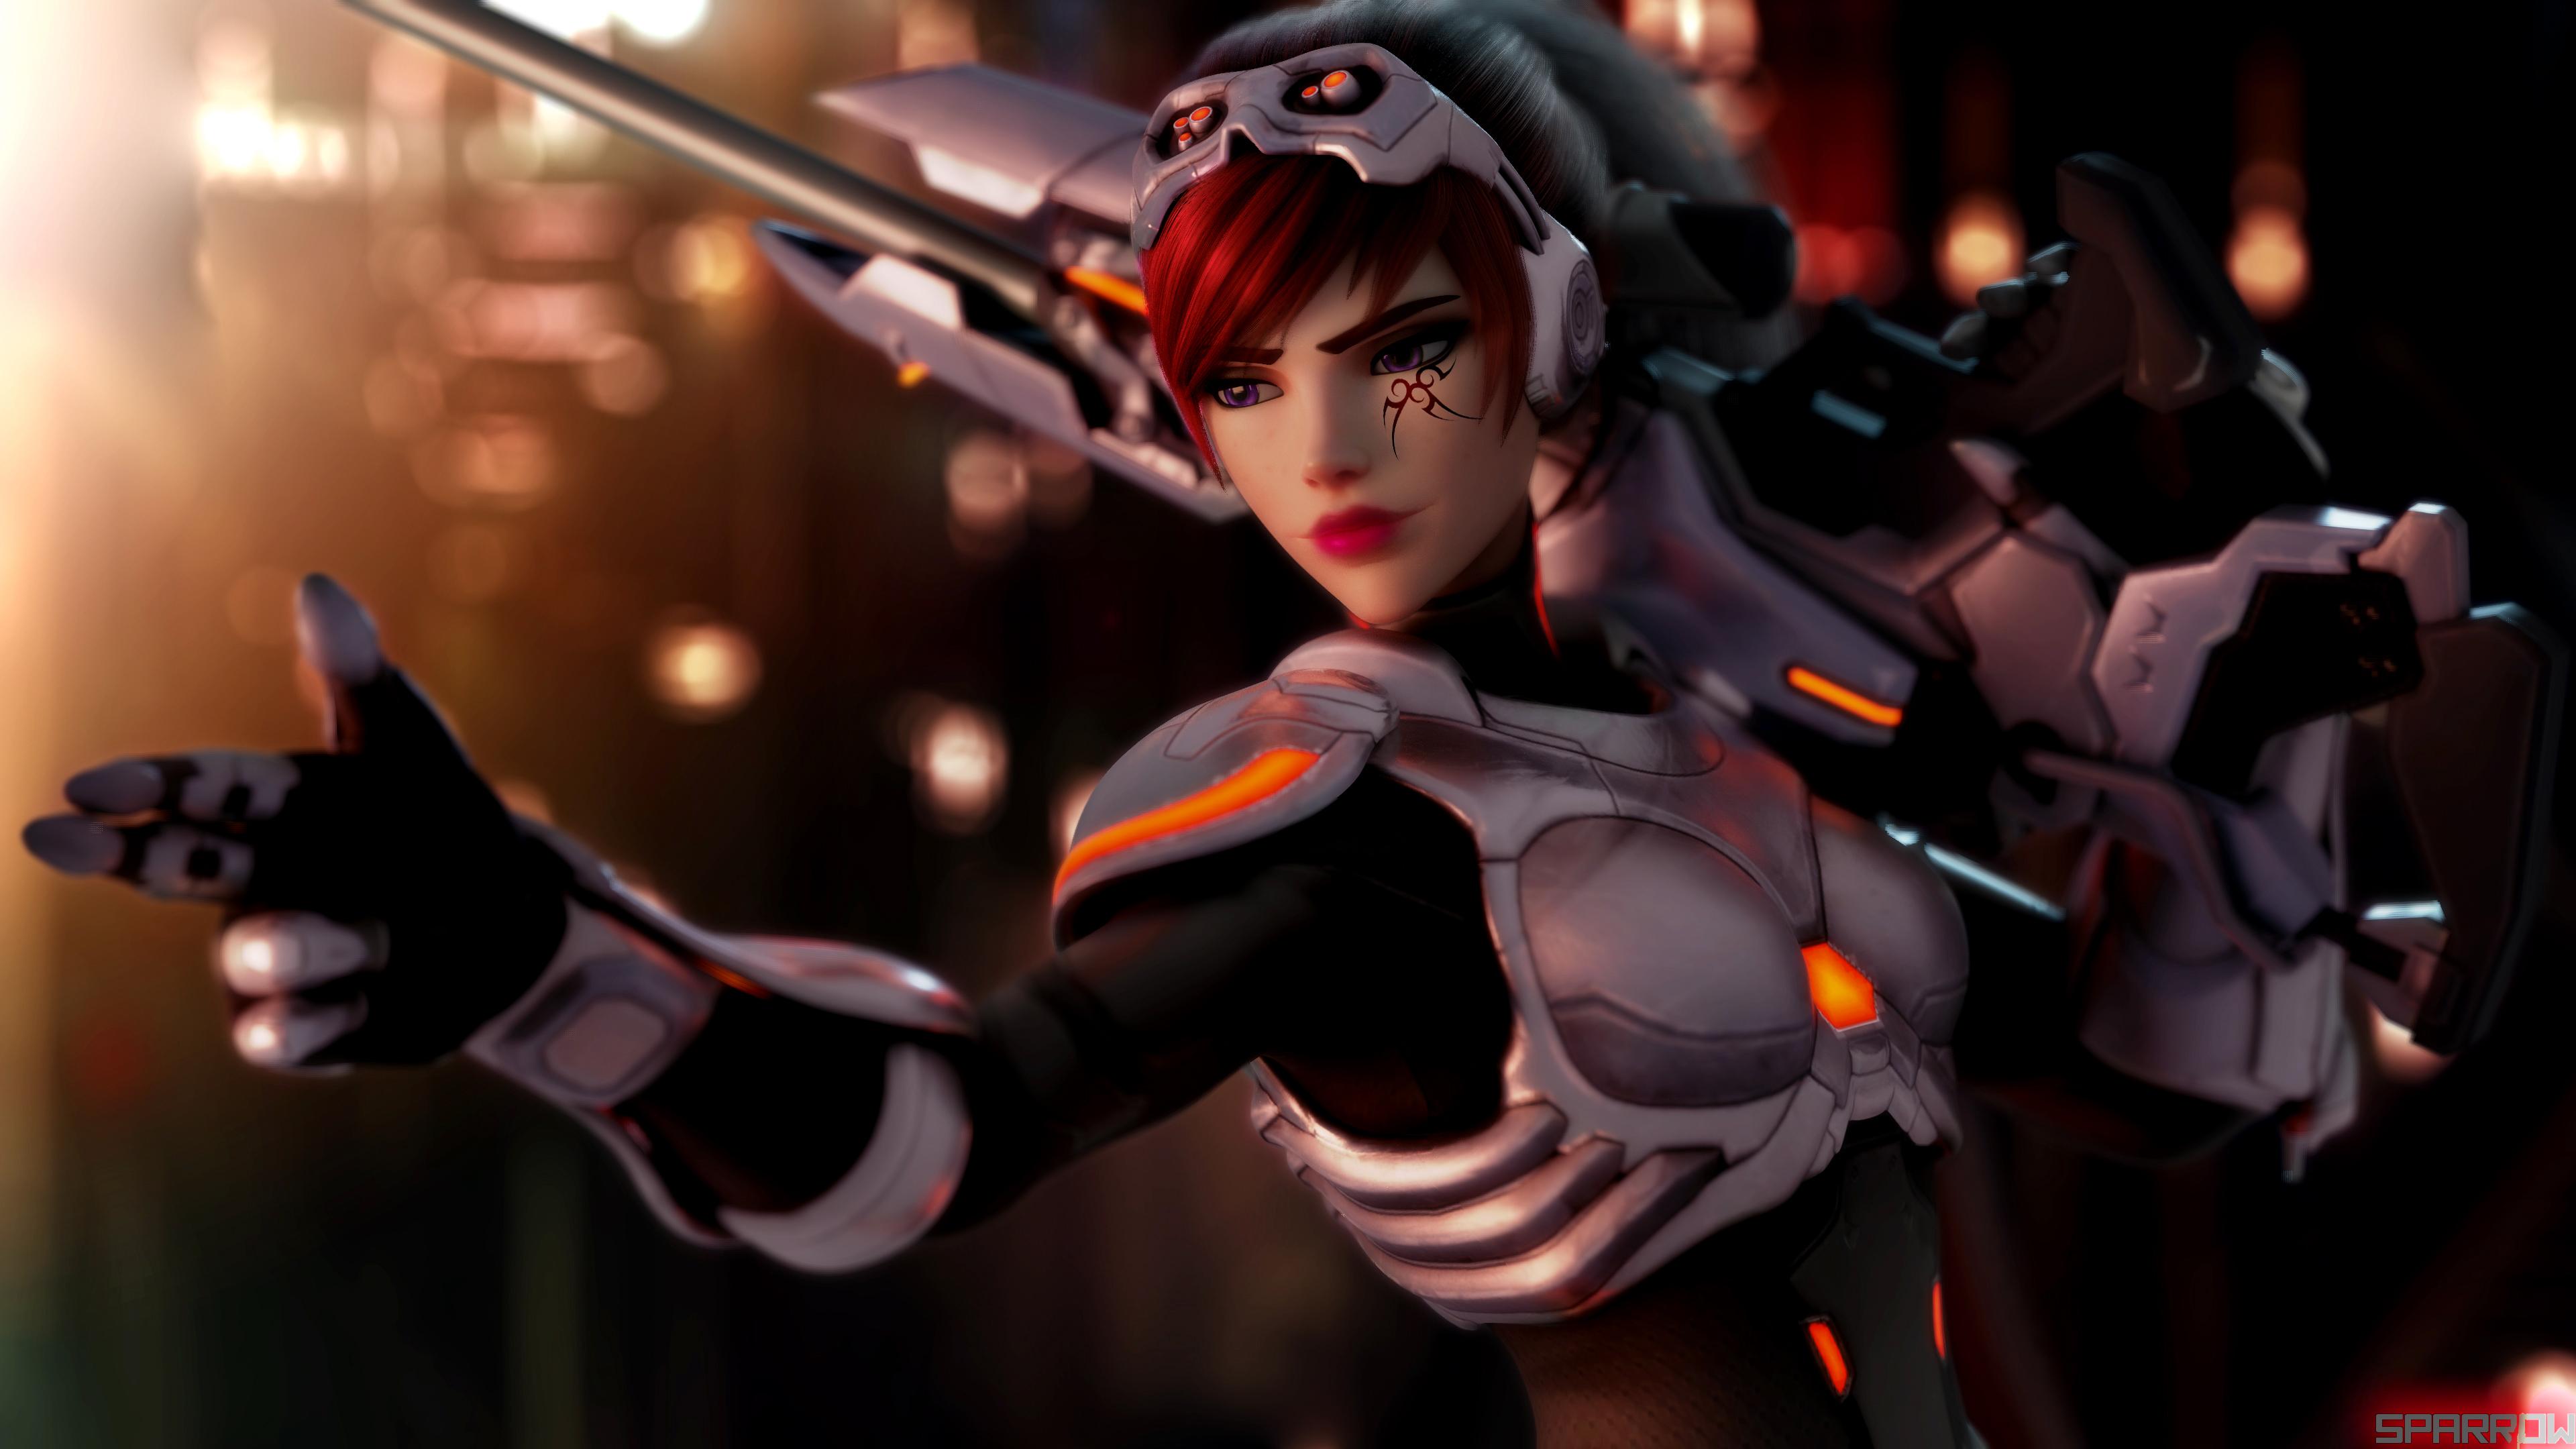 General 3840x2160 women weapon makeup widowmaker Overwatch video games Widowmaker (Overwatch)